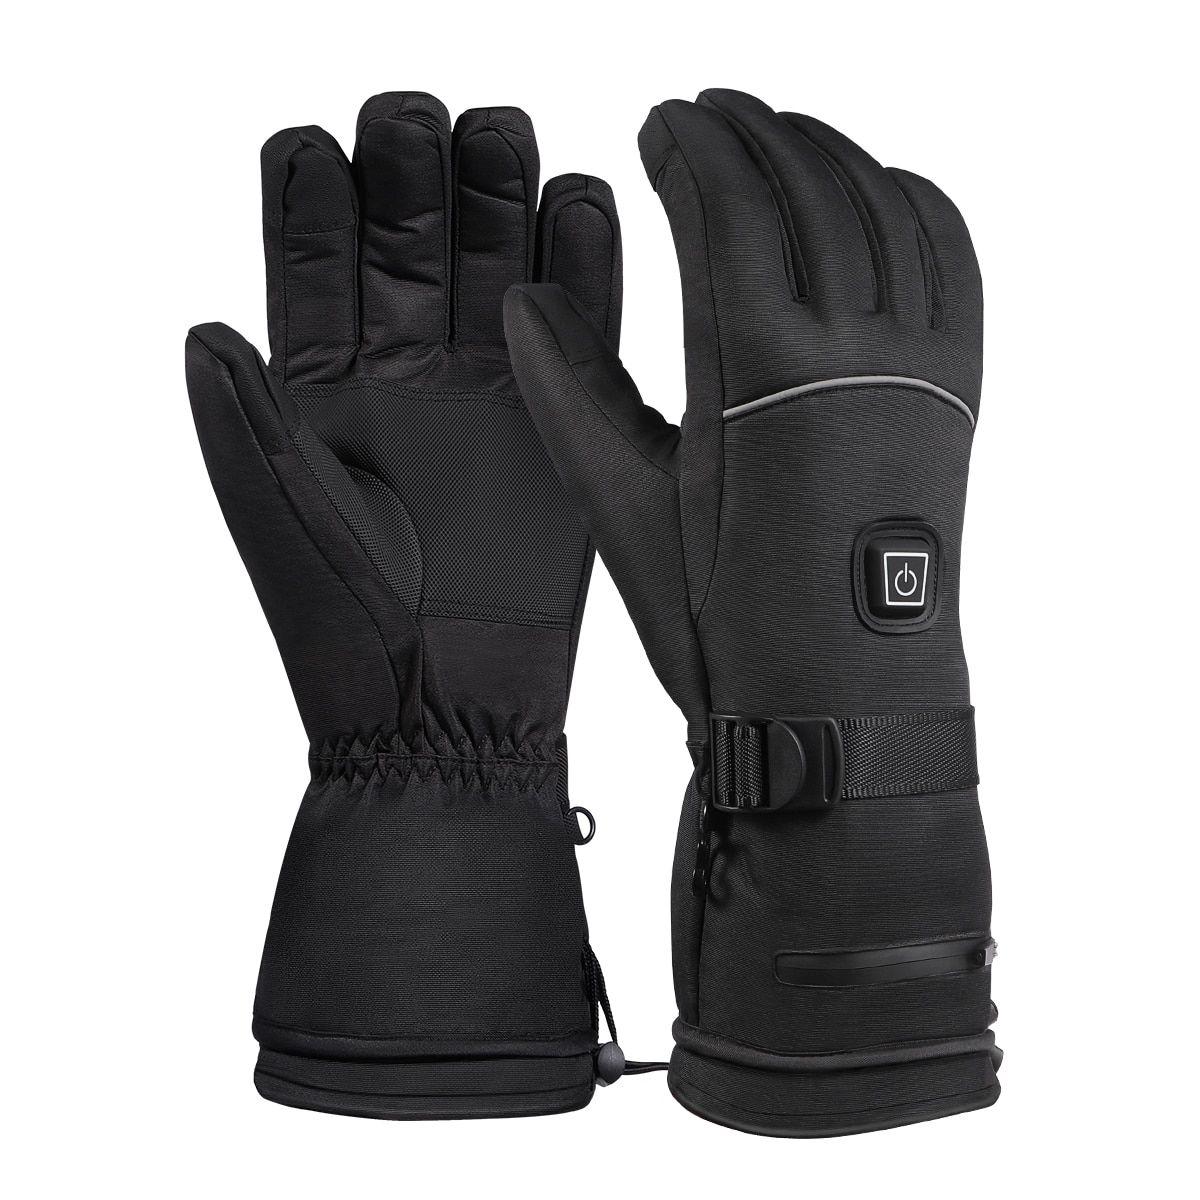 Estimated Heating Times Warm 45 C 15000 Mah 8 12 Hours Comfortable 35 C 15000 Mah 10 14 Hours Energy Saving 25 C 15 Hand Warmers Warm Gloves Heated Gloves